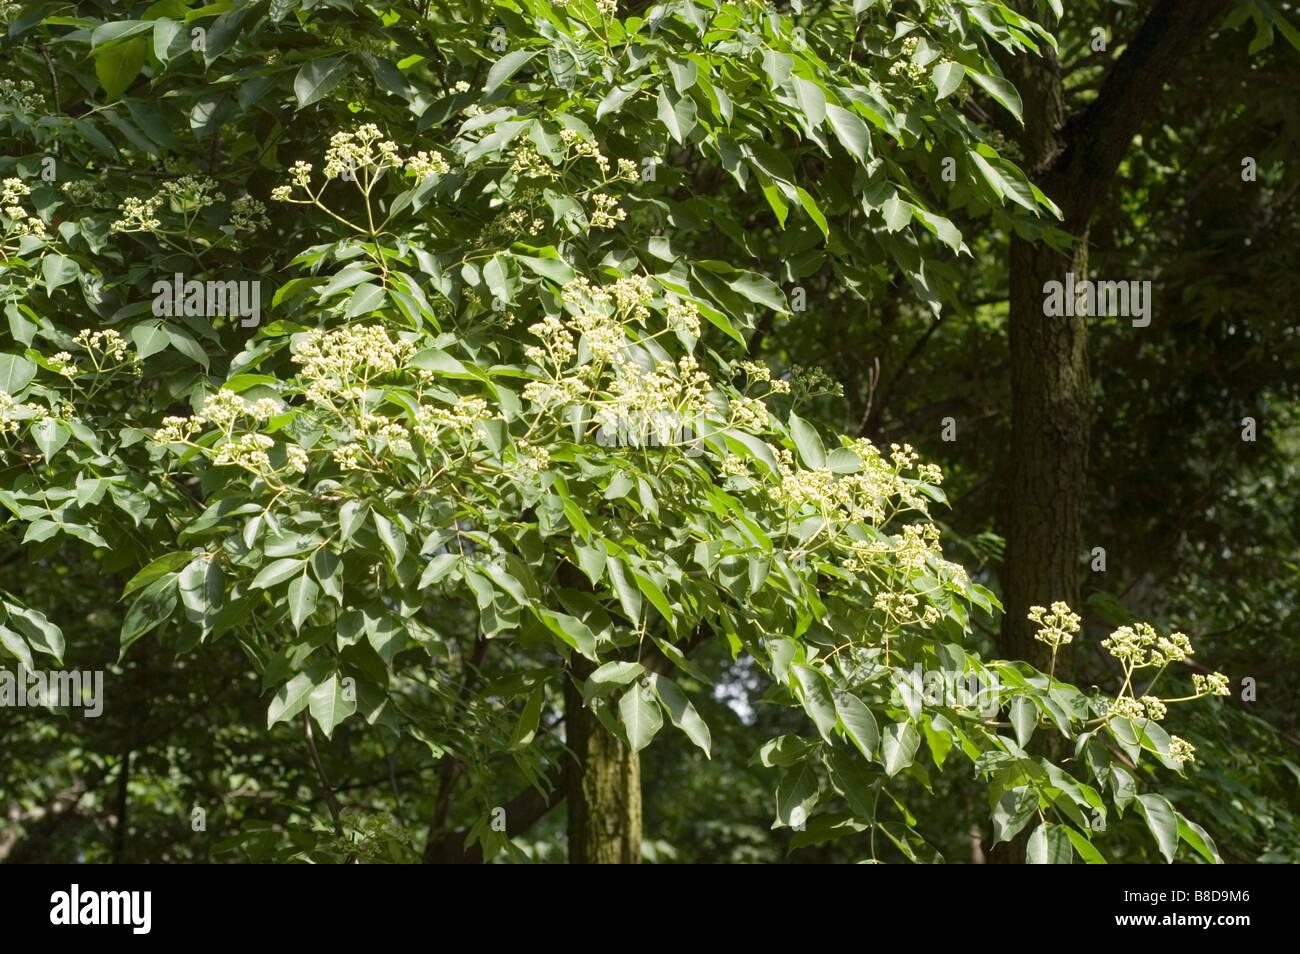 Grüne Blätter auf Koreanisch Evodia oder Biene Biene Ast Rutaceae, Tetradium Daniellii, Korea, Asien Stockbild